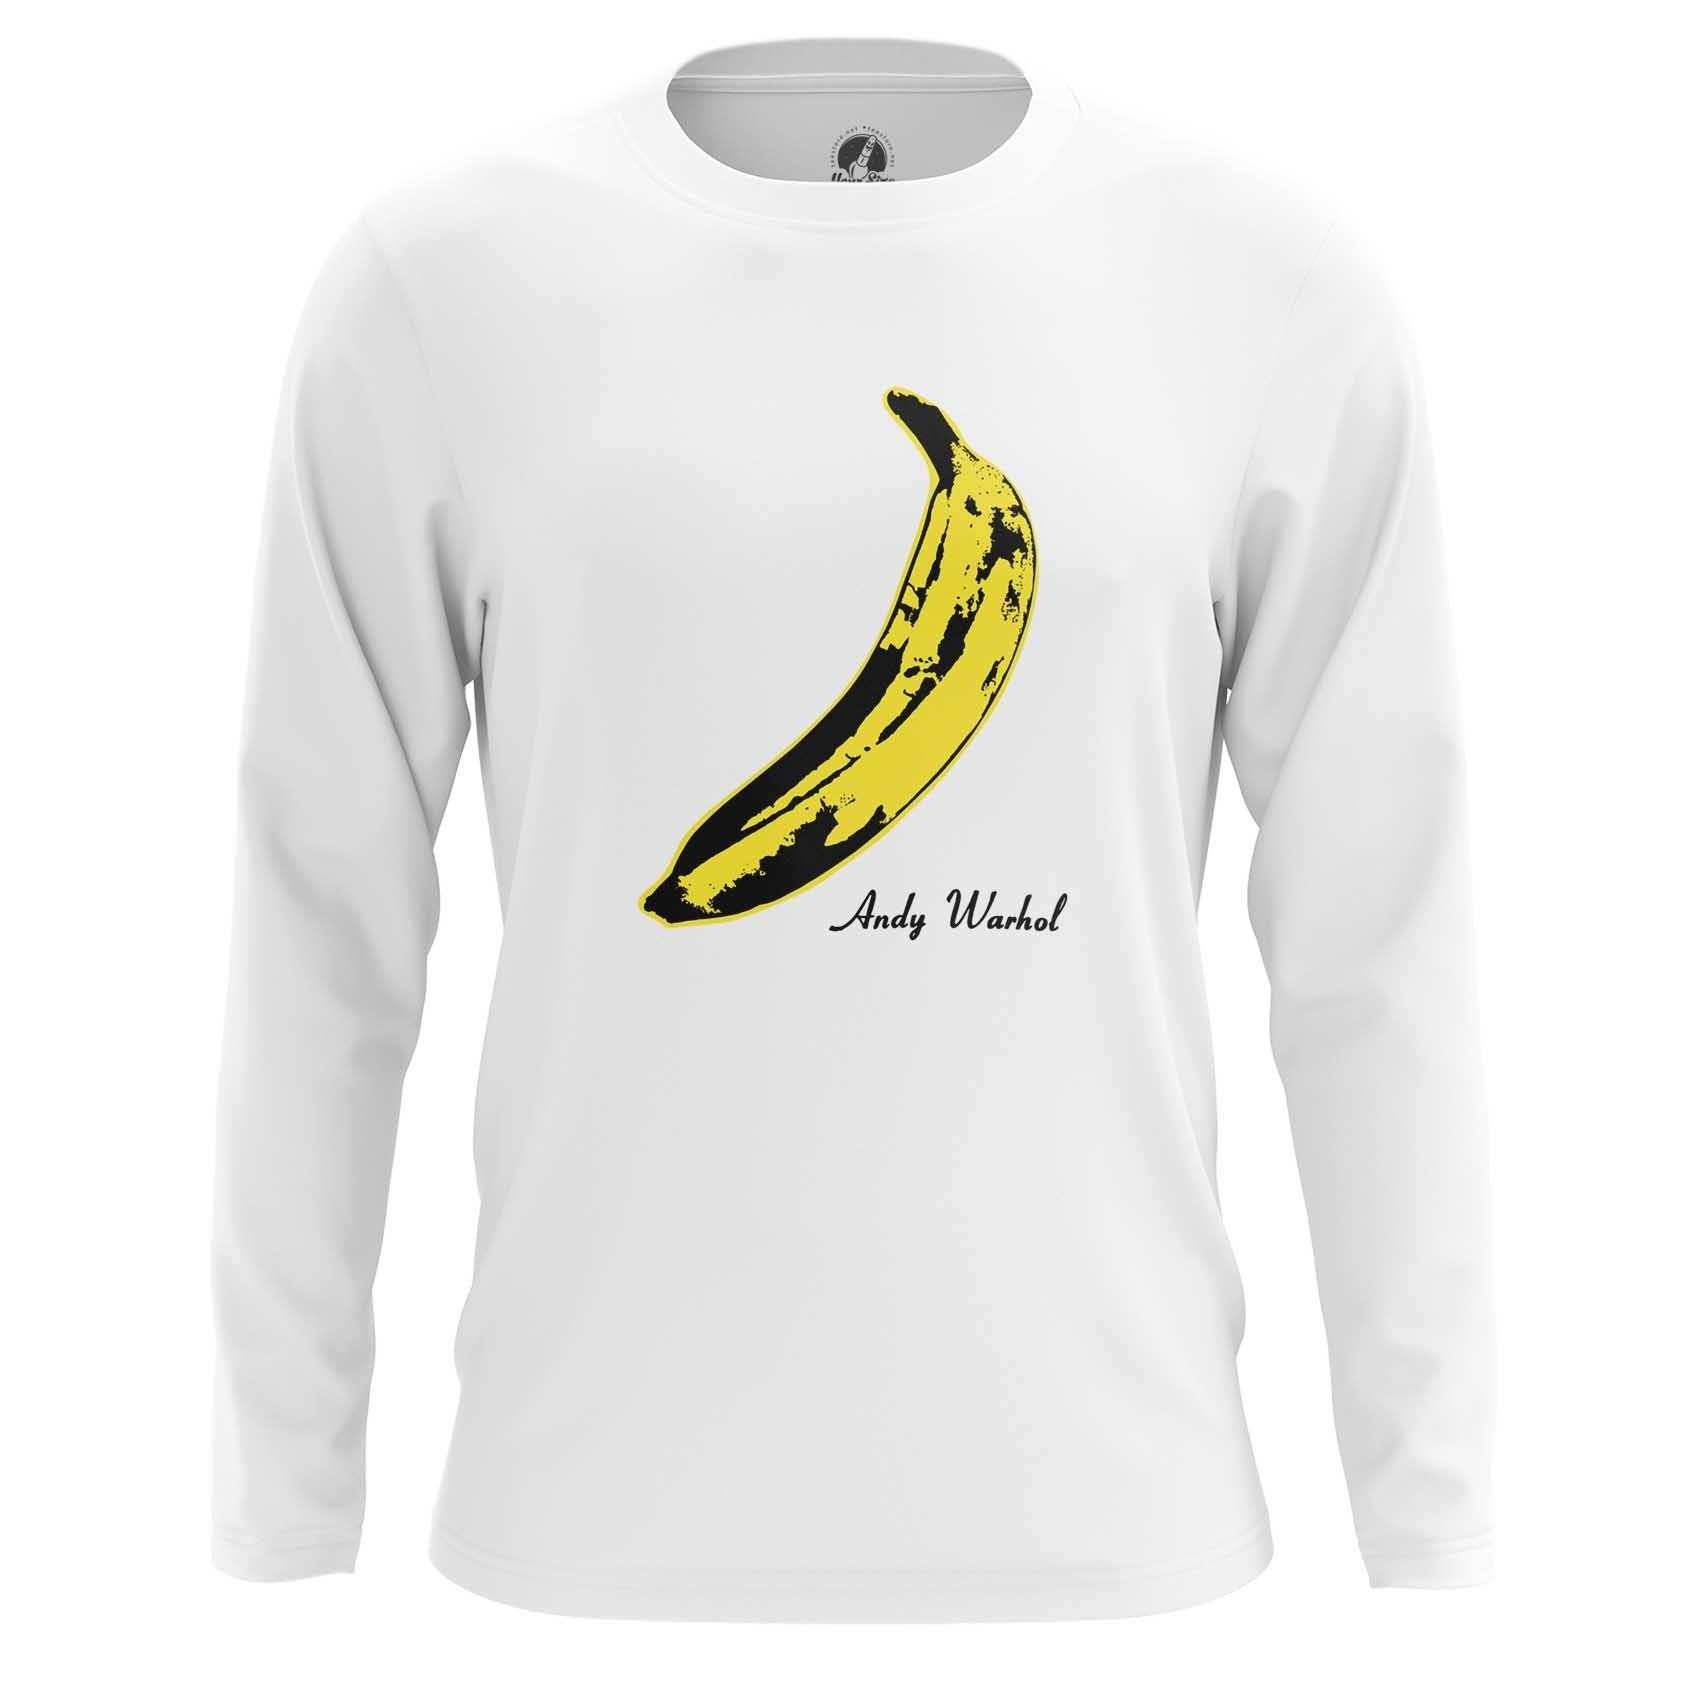 Merch T-Shirt Andy Warhol Banana Velvet Underground